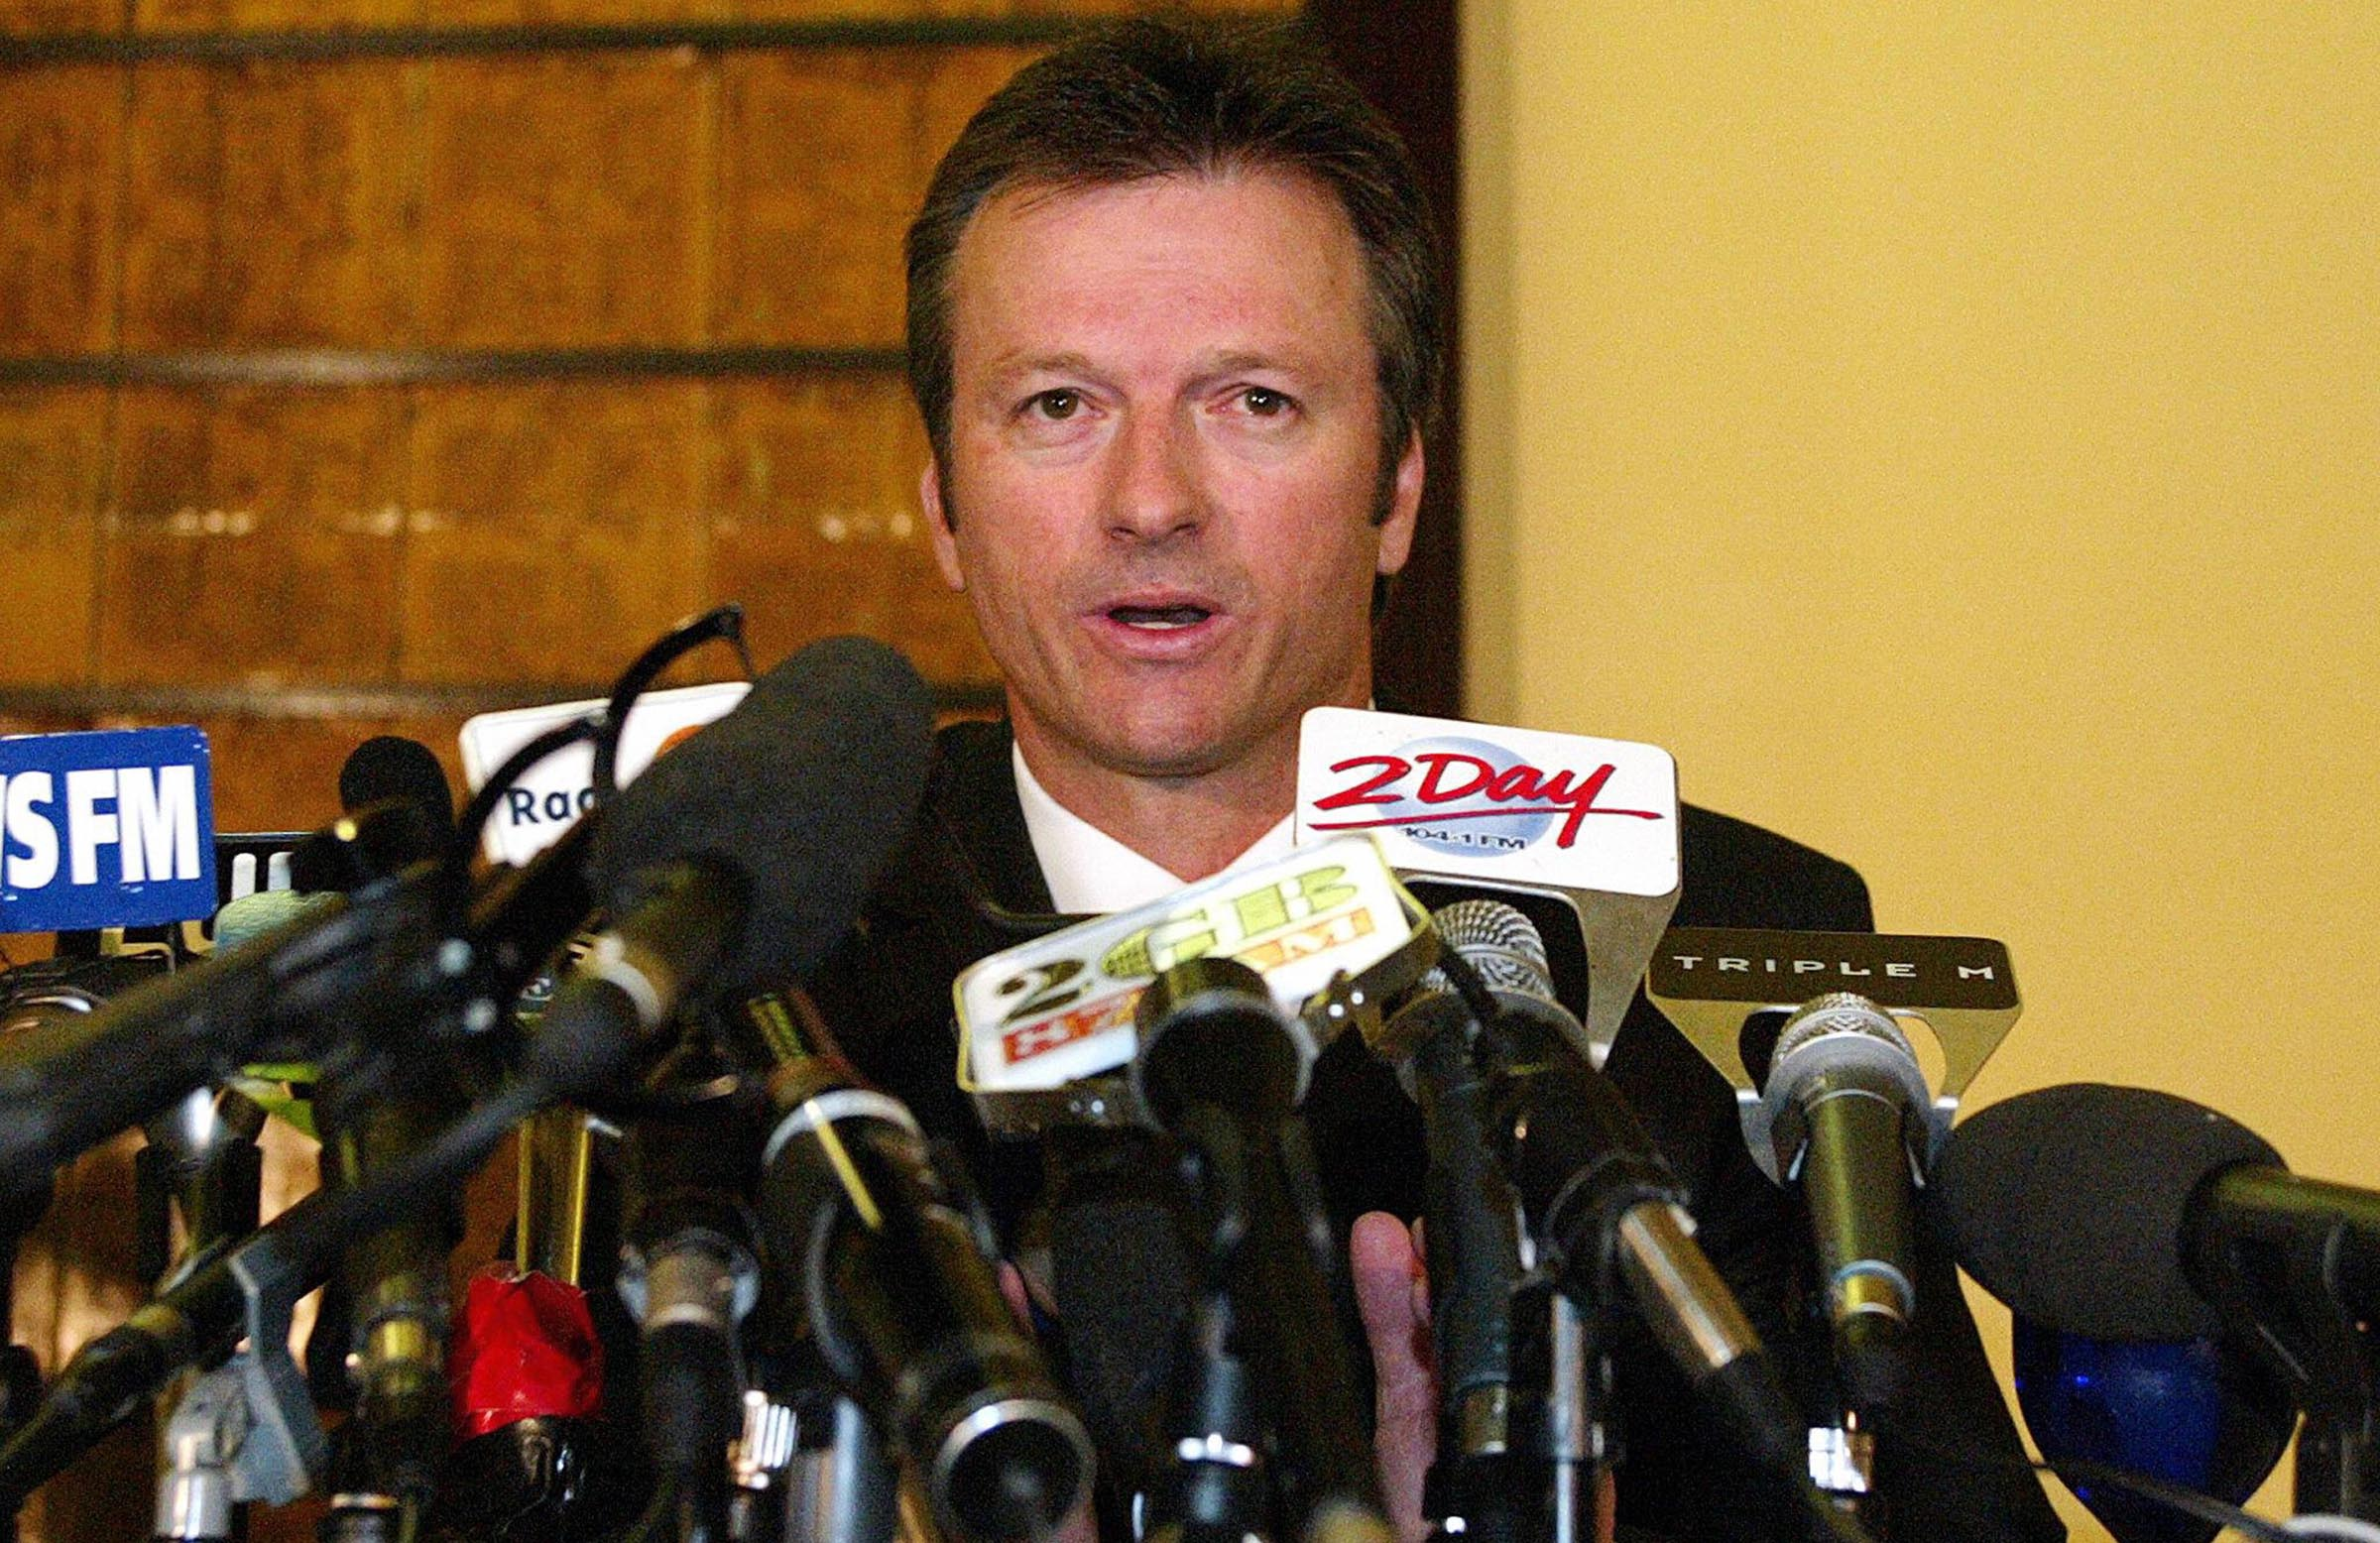 Waugh's final Test series drew massive media interest // Getty